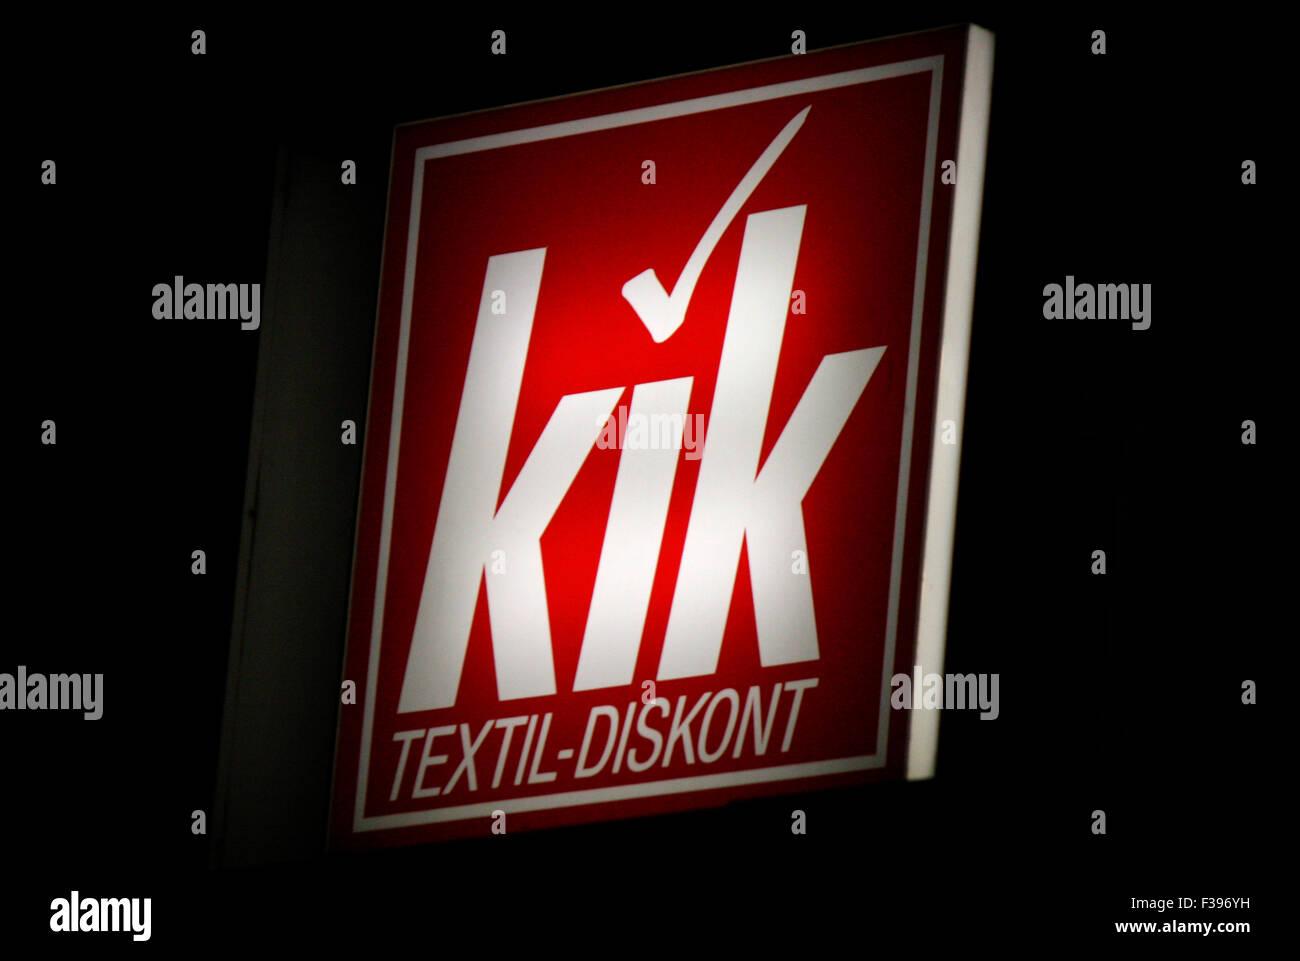 Markenname: 'kik Textil-Discount', Berlin. - Stock Image